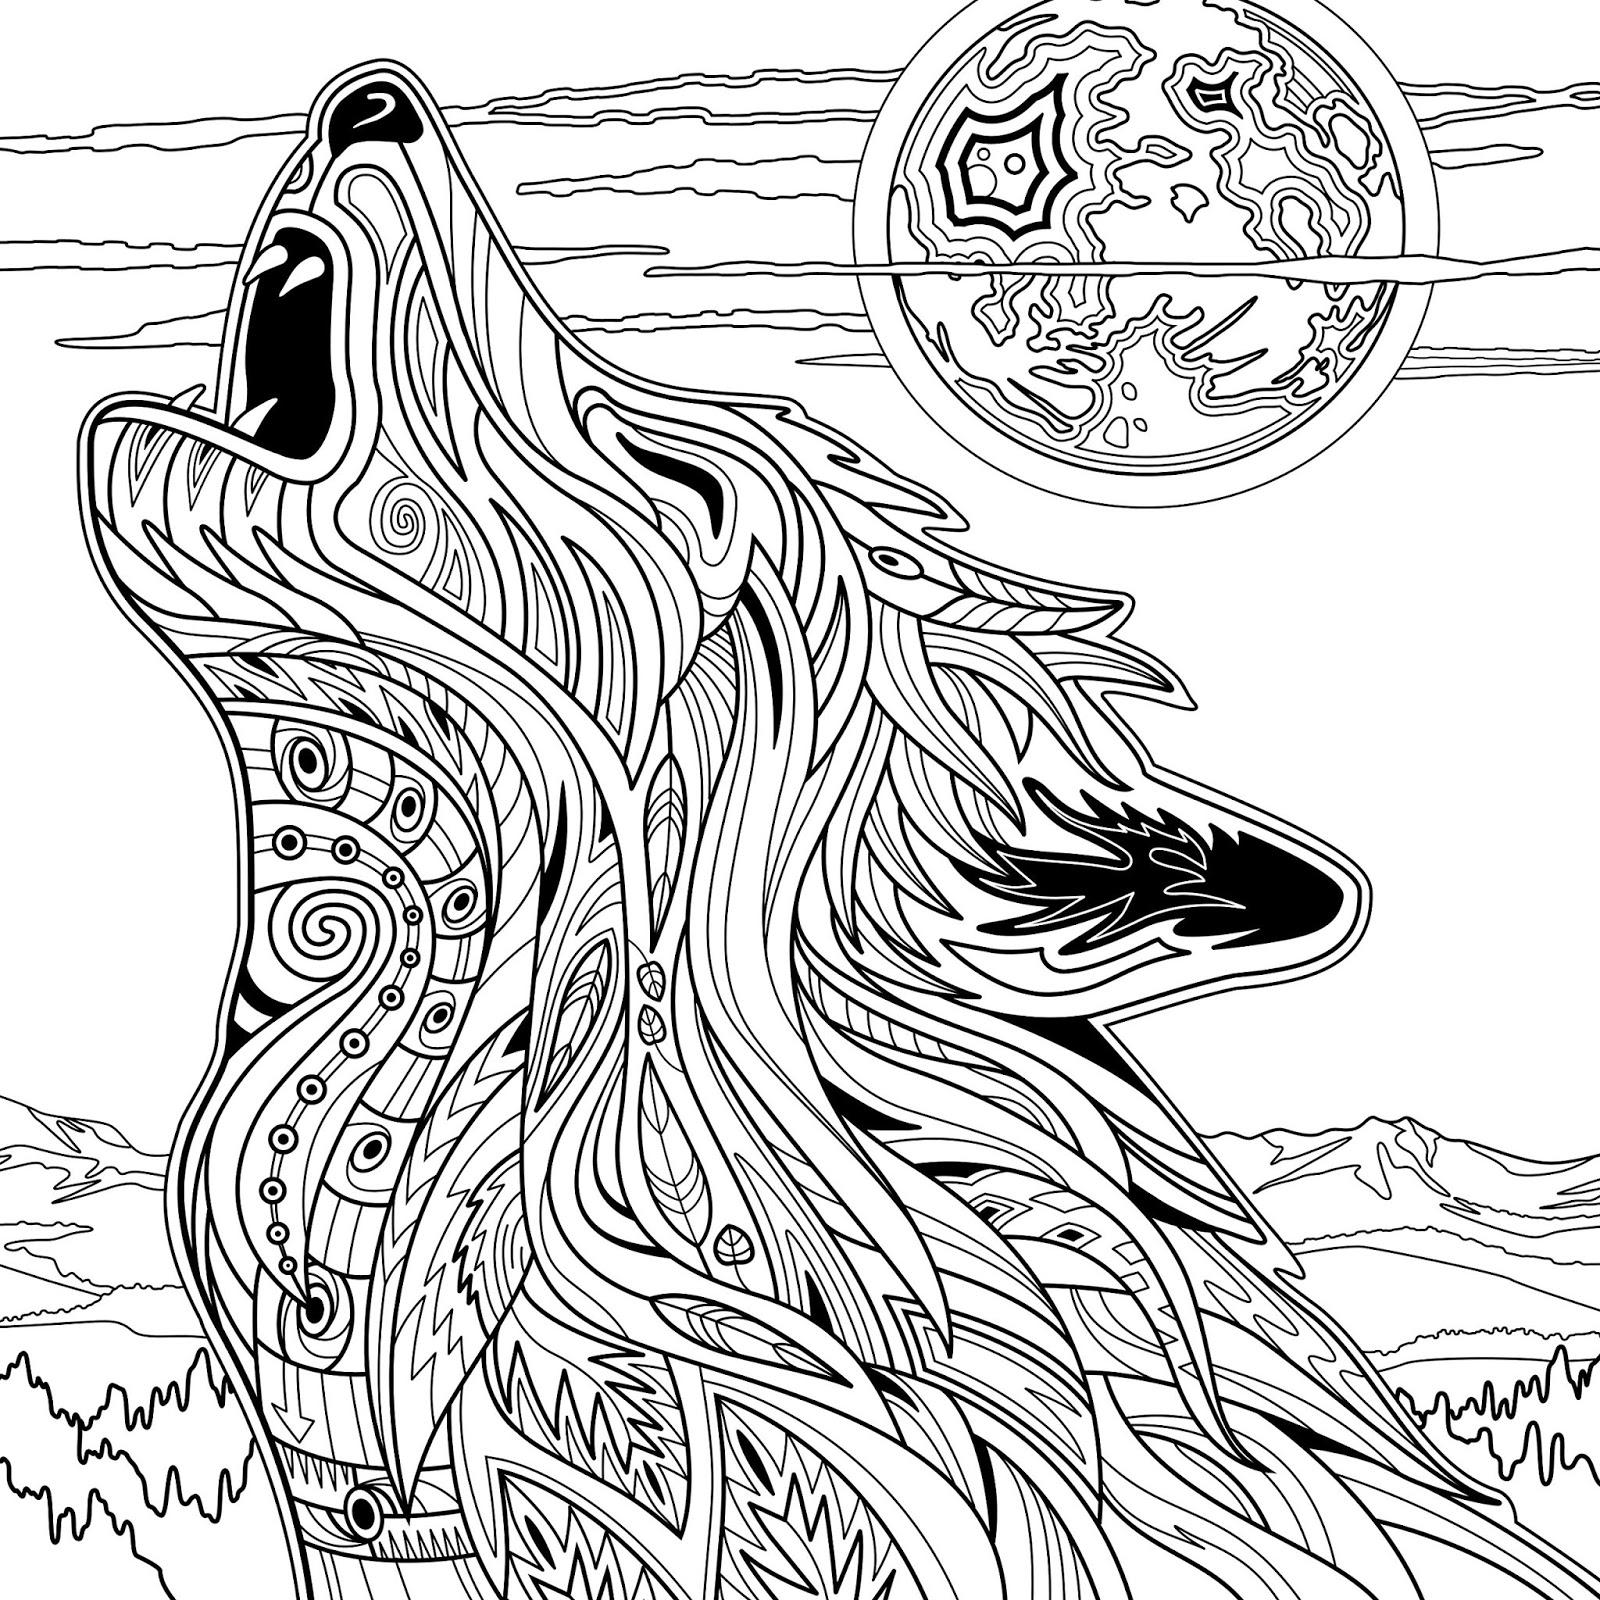 20 Desenhos Para Adultos Colorirem Imprimir